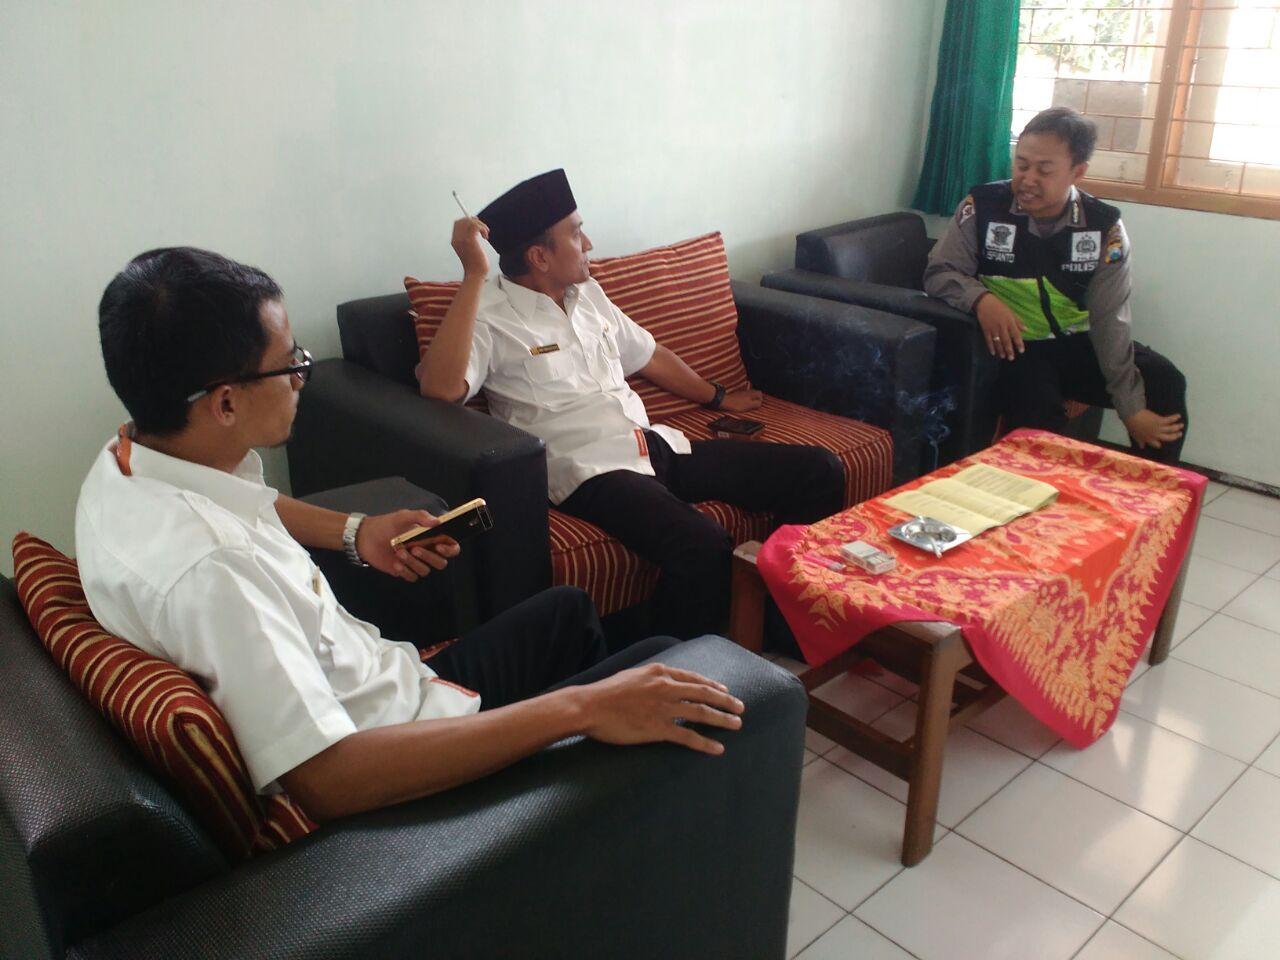 Bhabin Kelurahan Temas Polsek Batu Kota Kordinasi Bersama Lurah Temas Sampaikan Pesan Kamtibmas